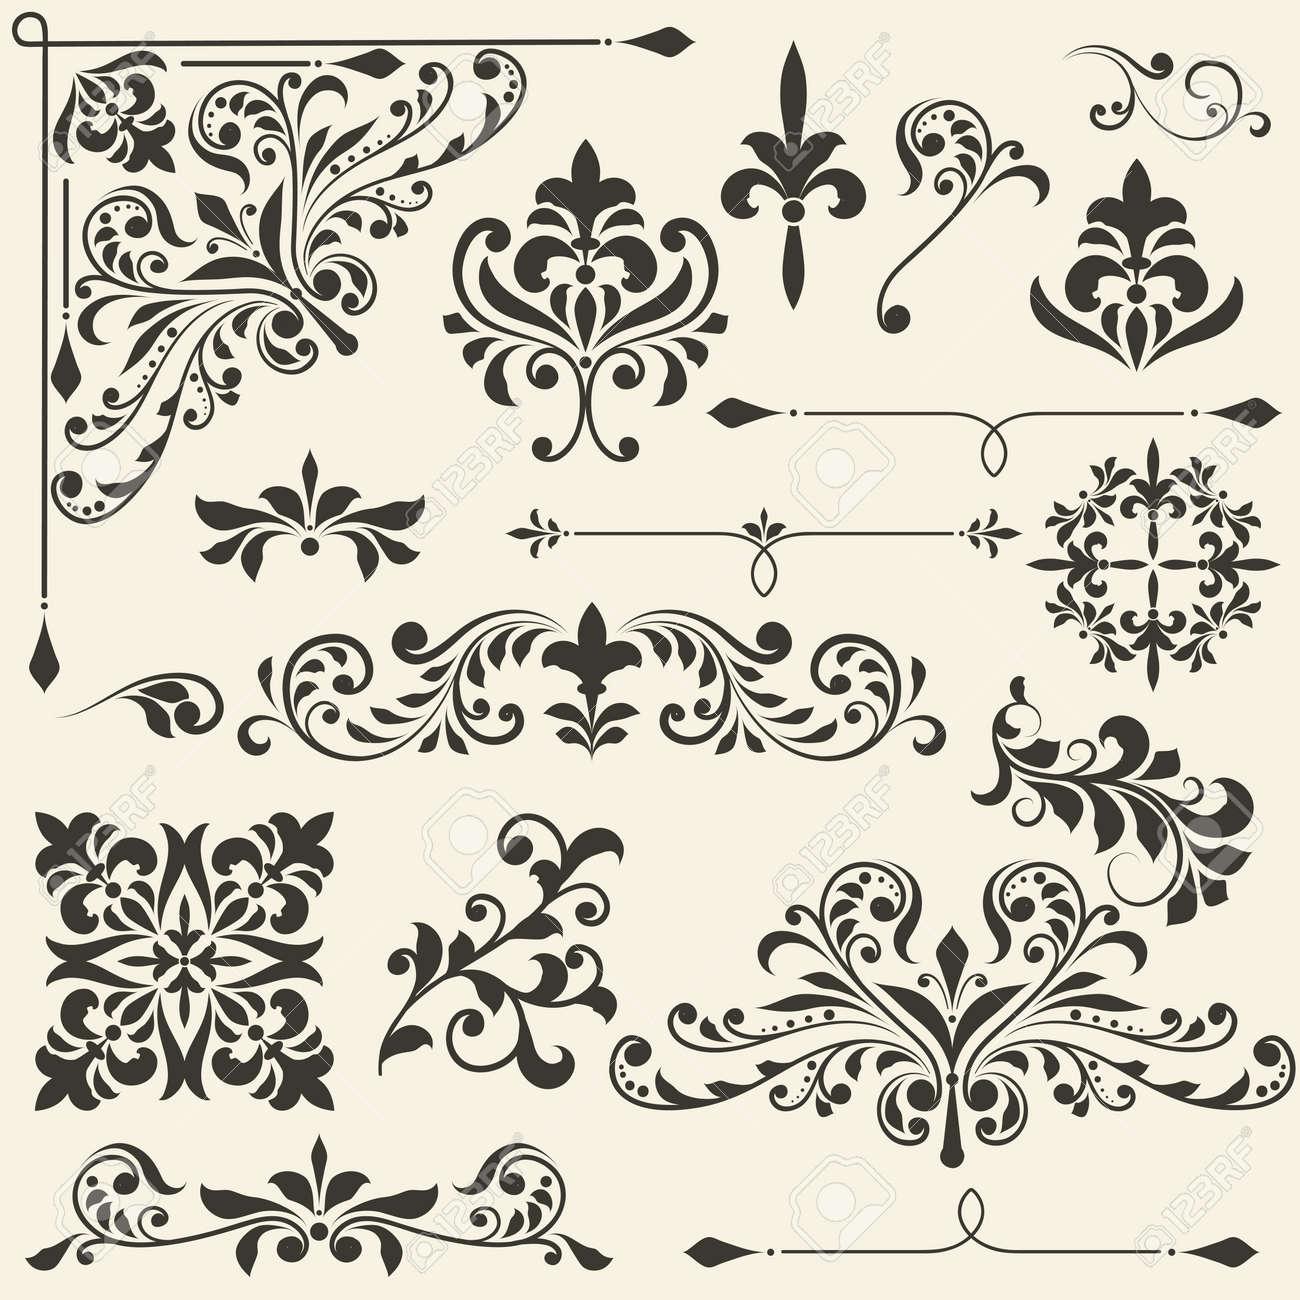 vintage floral  design elements on gradient background, fully editable file Stock Vector - 18754633